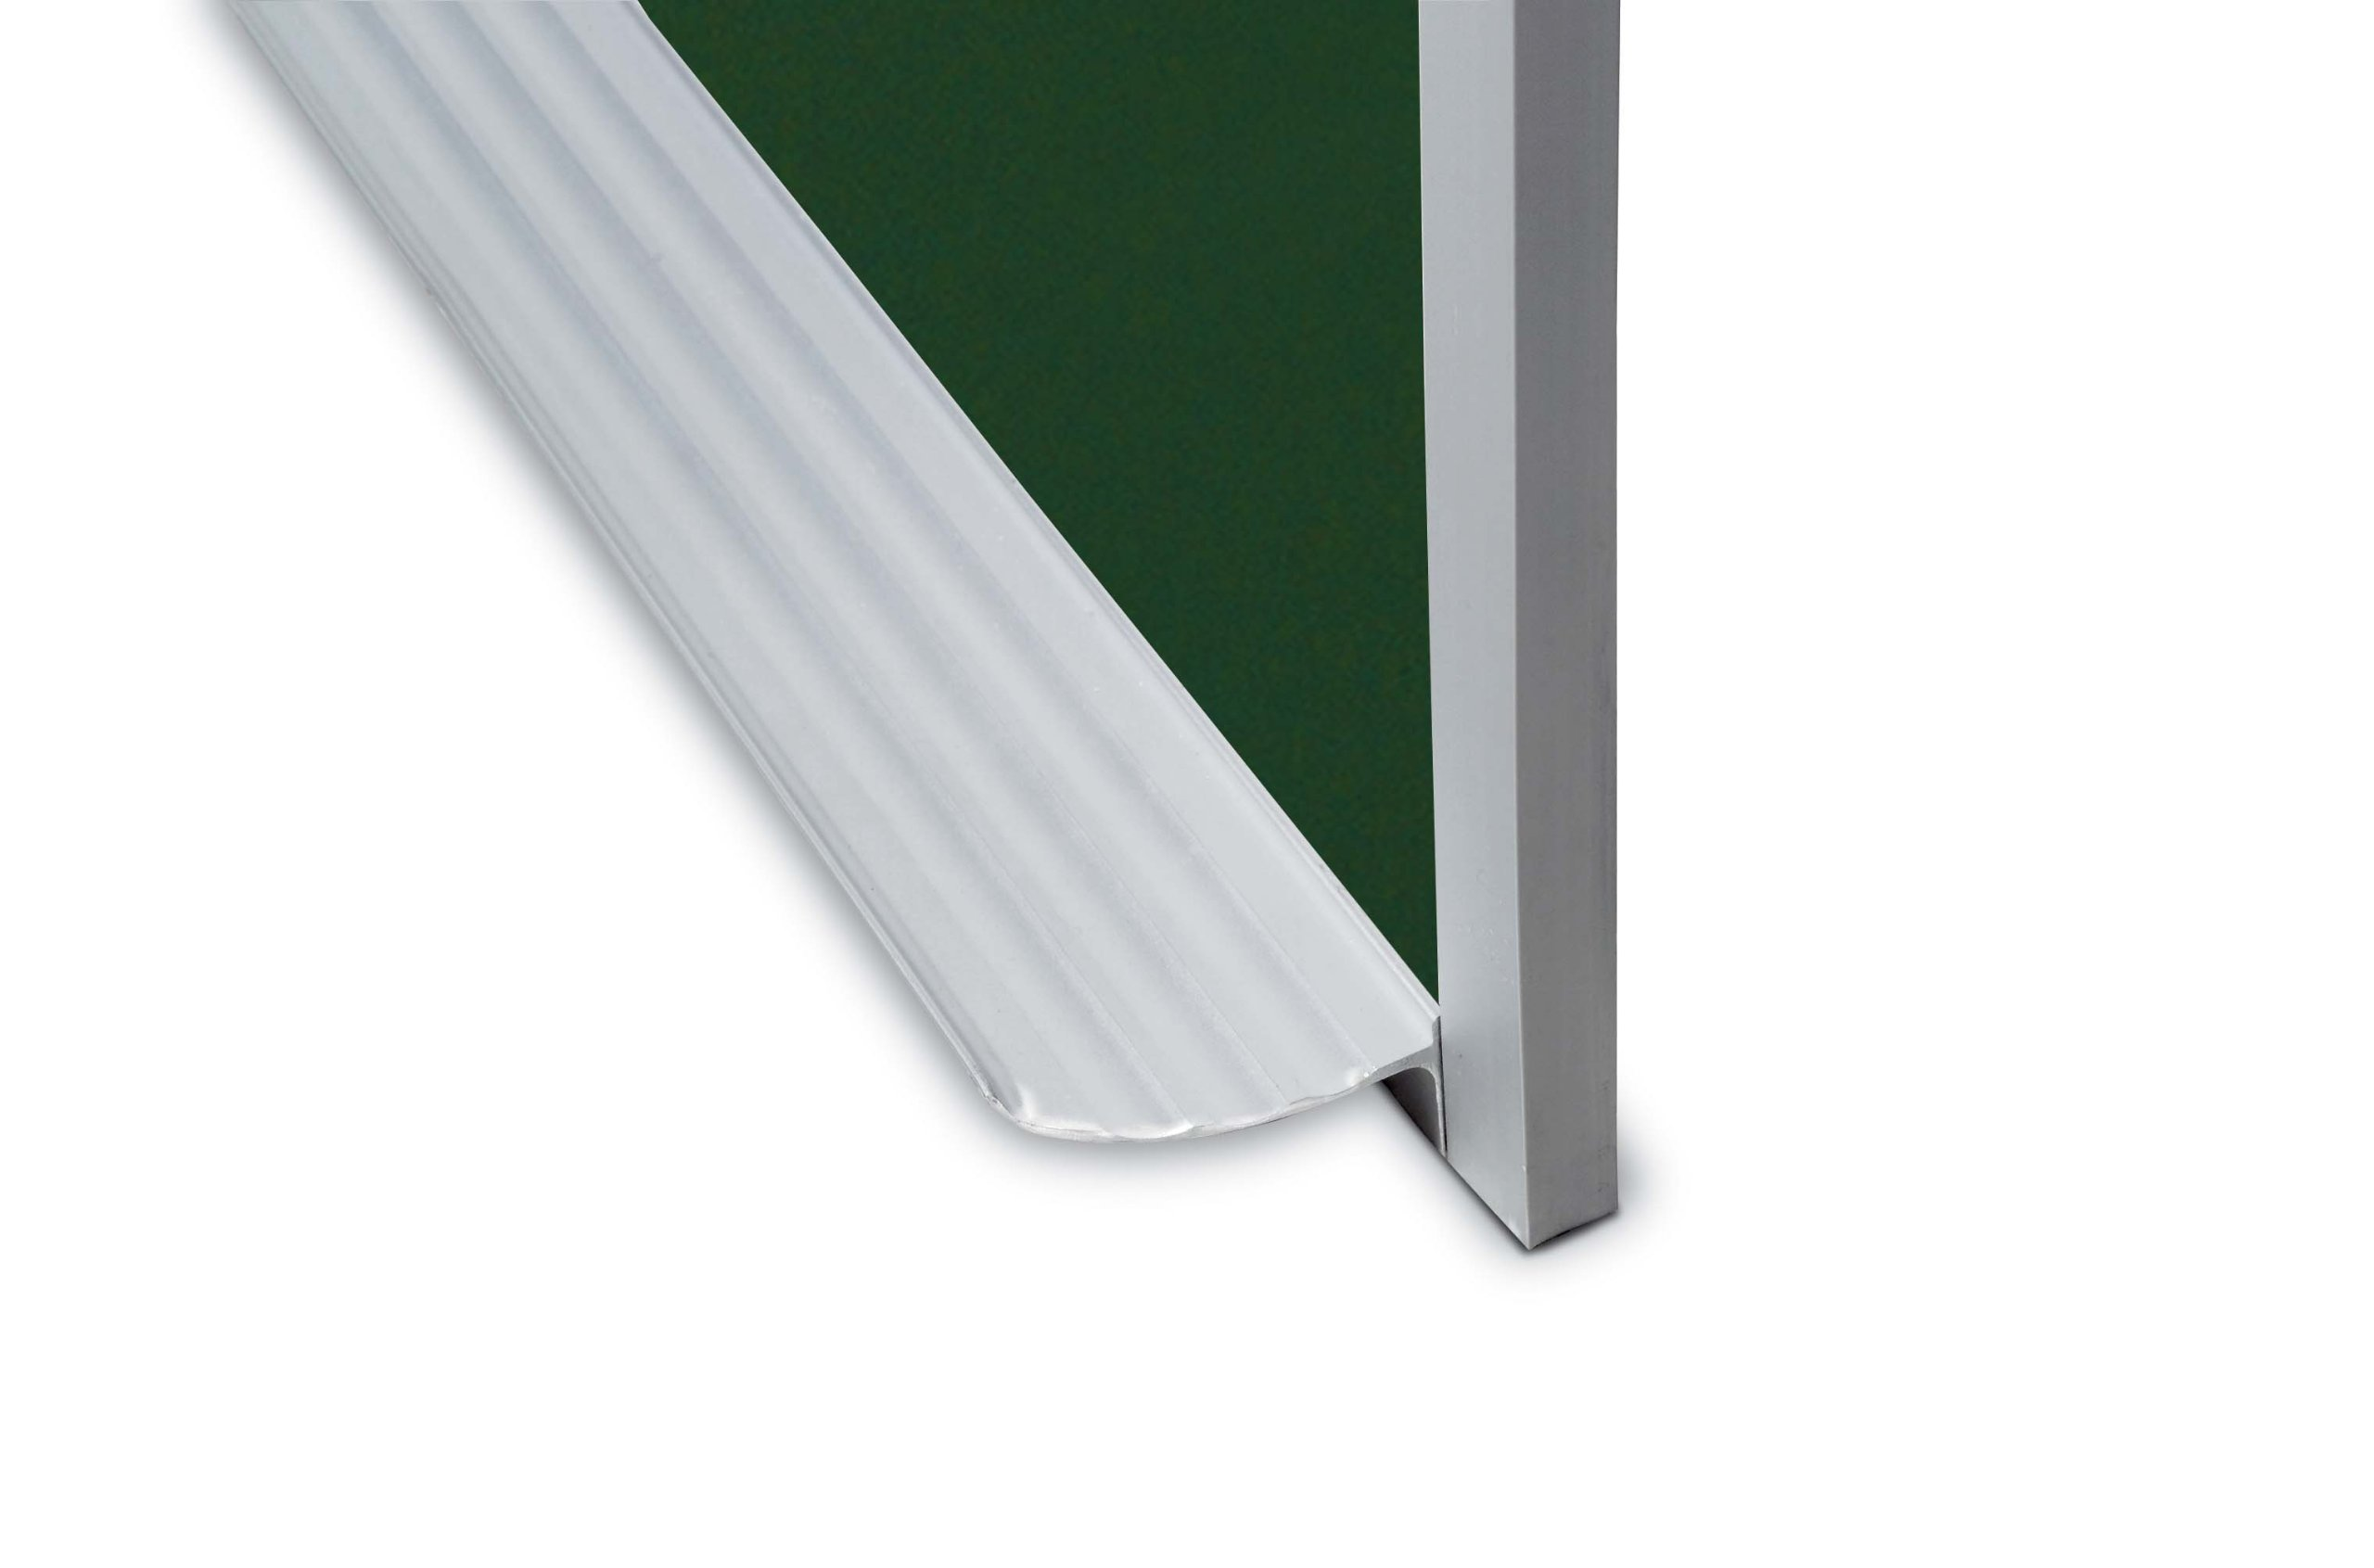 Marsh Pr516-3431-6500 Pro-Rite 60X192 Green Porcelain Chalkboard, Standard With Hanger Bar Aluminum Trim / 1'' Map Rail by Marsh (Image #2)